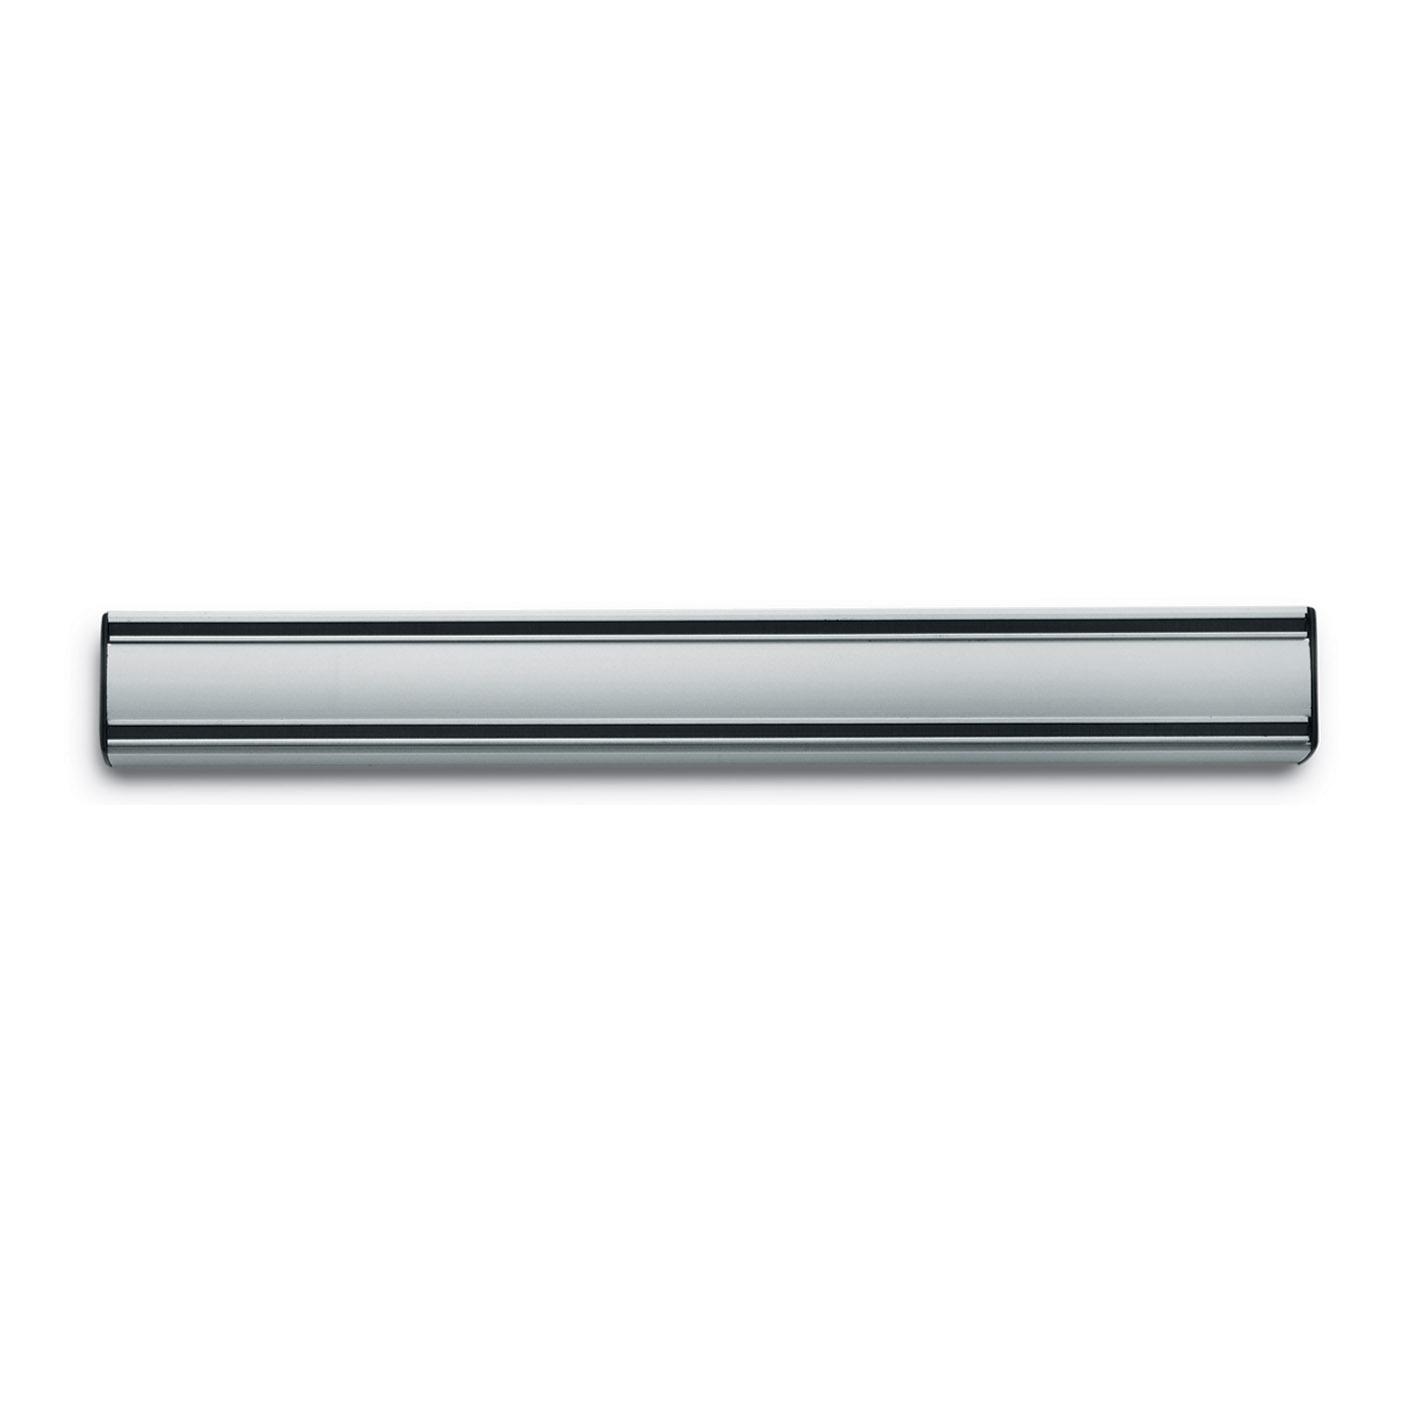 Magnetická lišta na nože 50 cm strieborná WÜSTHOF